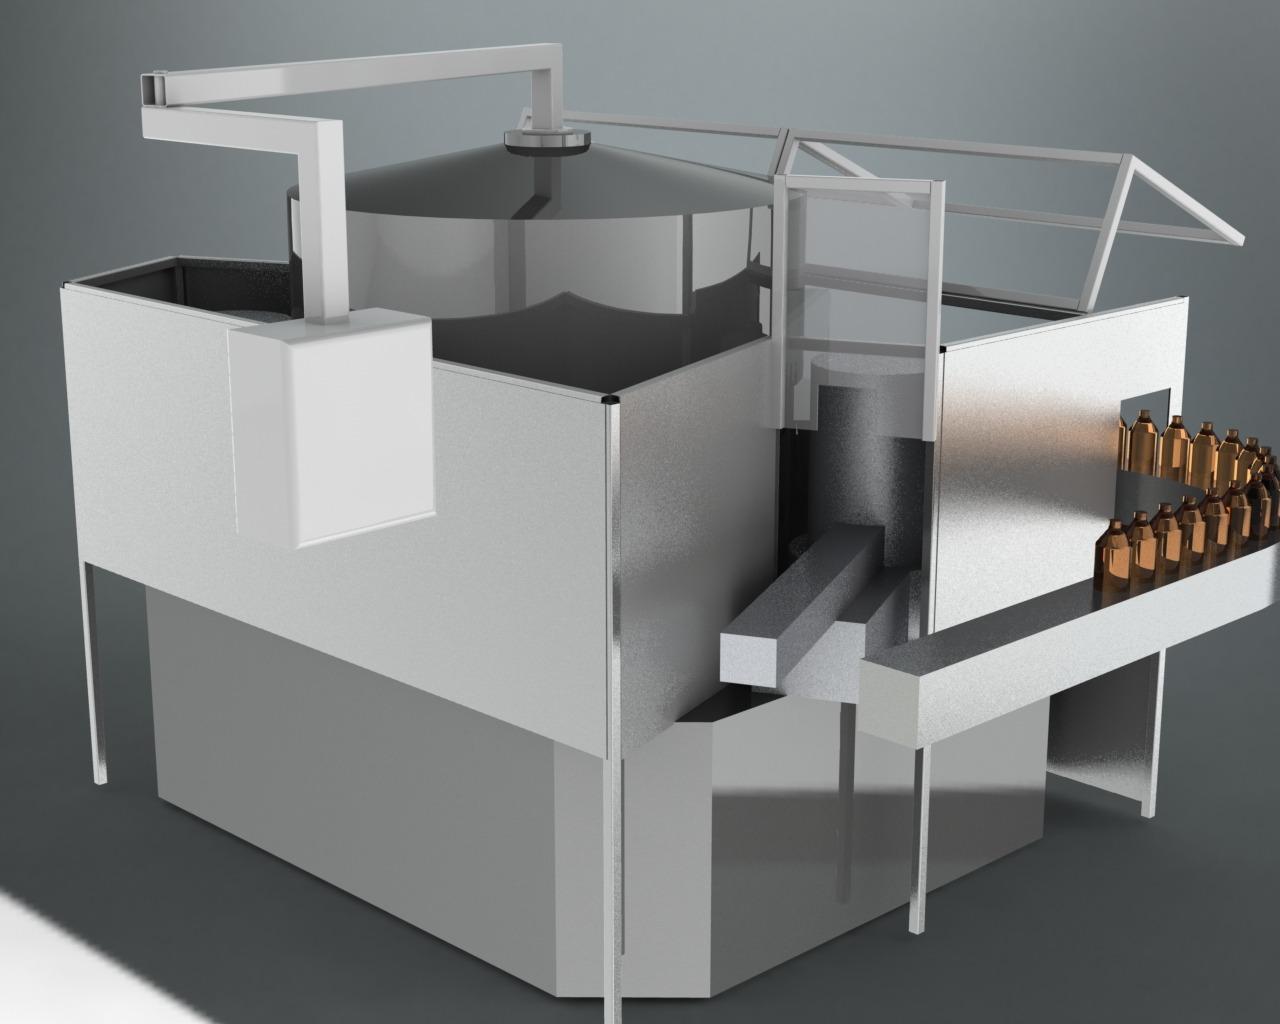 CAD Design Concepts for Equipment guards (2) - Change Parts